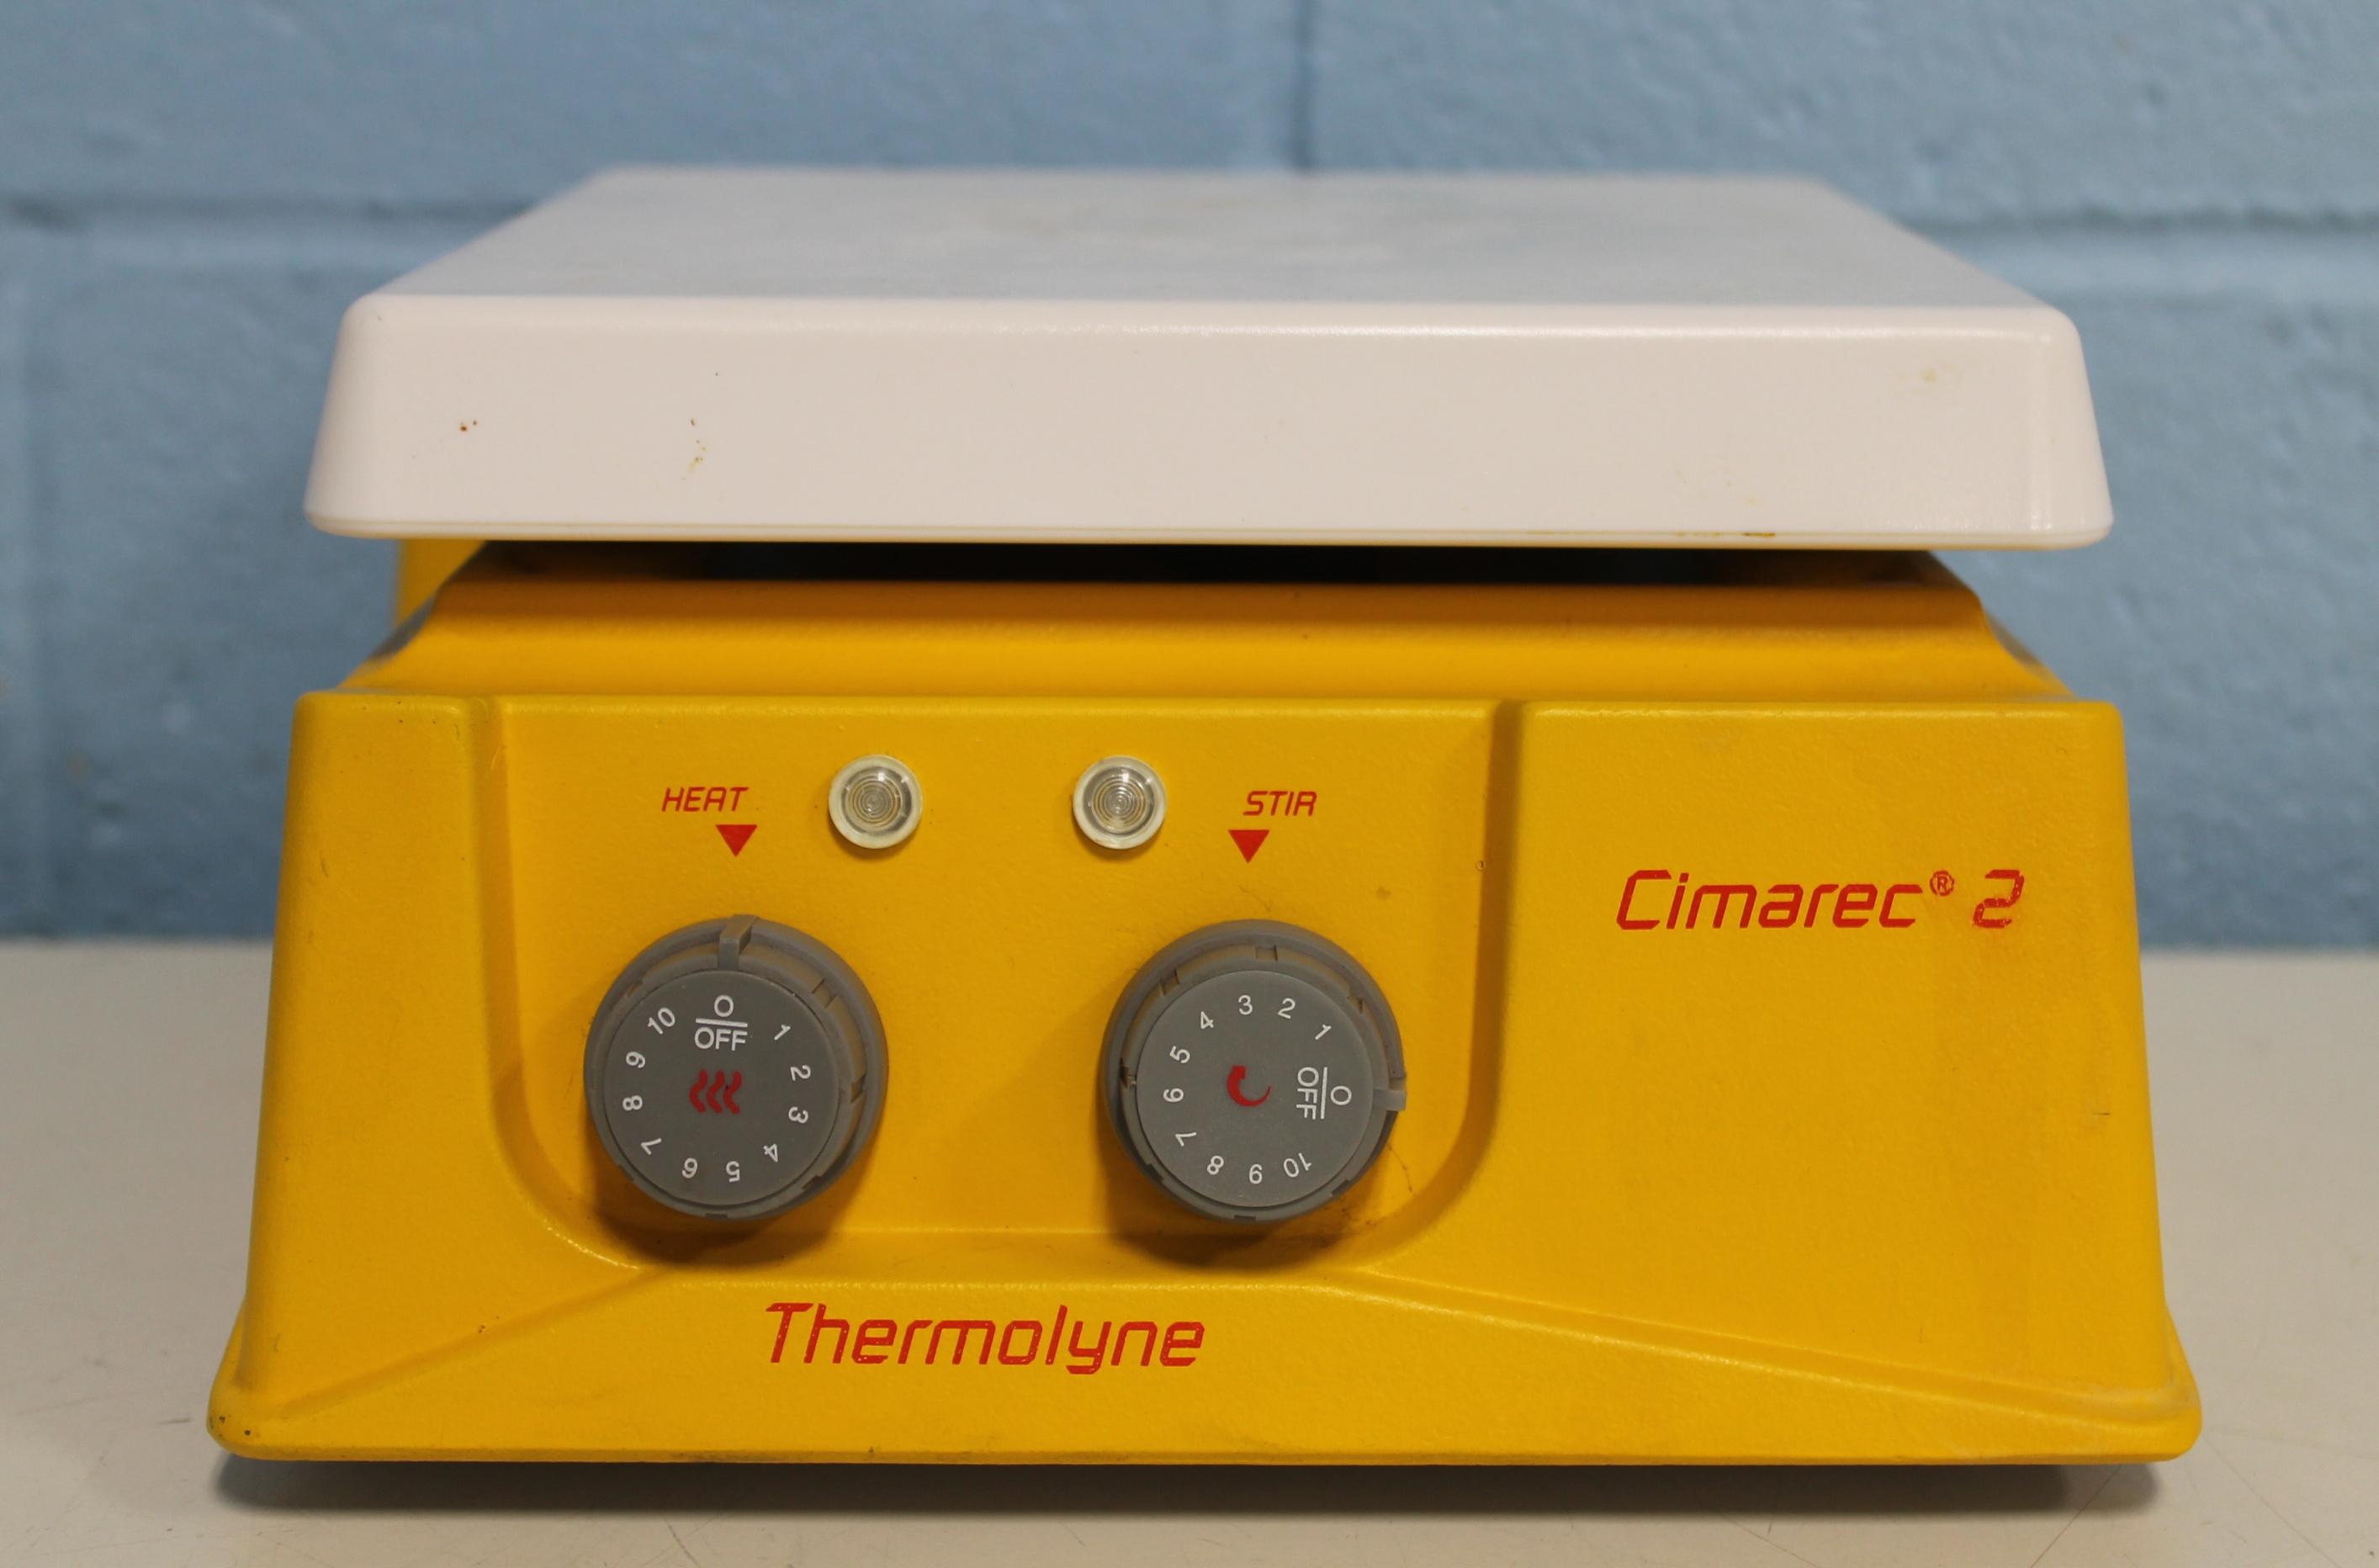 Thermolyne Cimarec 2 Hotplate Stirrer SP46925 Image